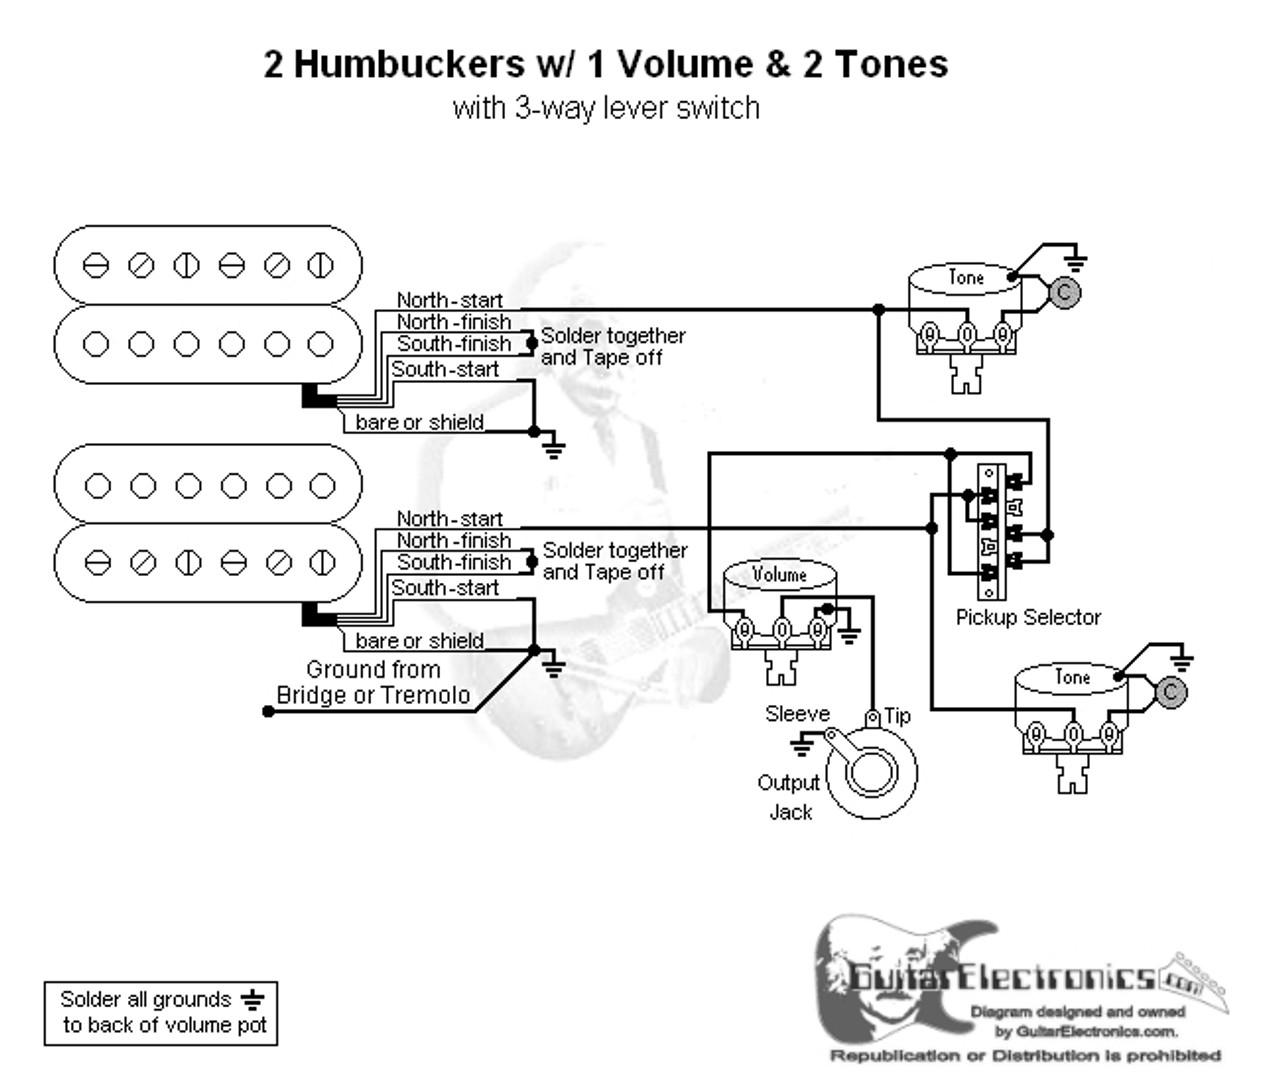 hight resolution of strat wiring diagram 1 volume 2 tones auto wiring diagram2 humbuckers 3 way lever switch 1 volume 2 tones hss strat wiring diagram 1 volume 2 tone strat